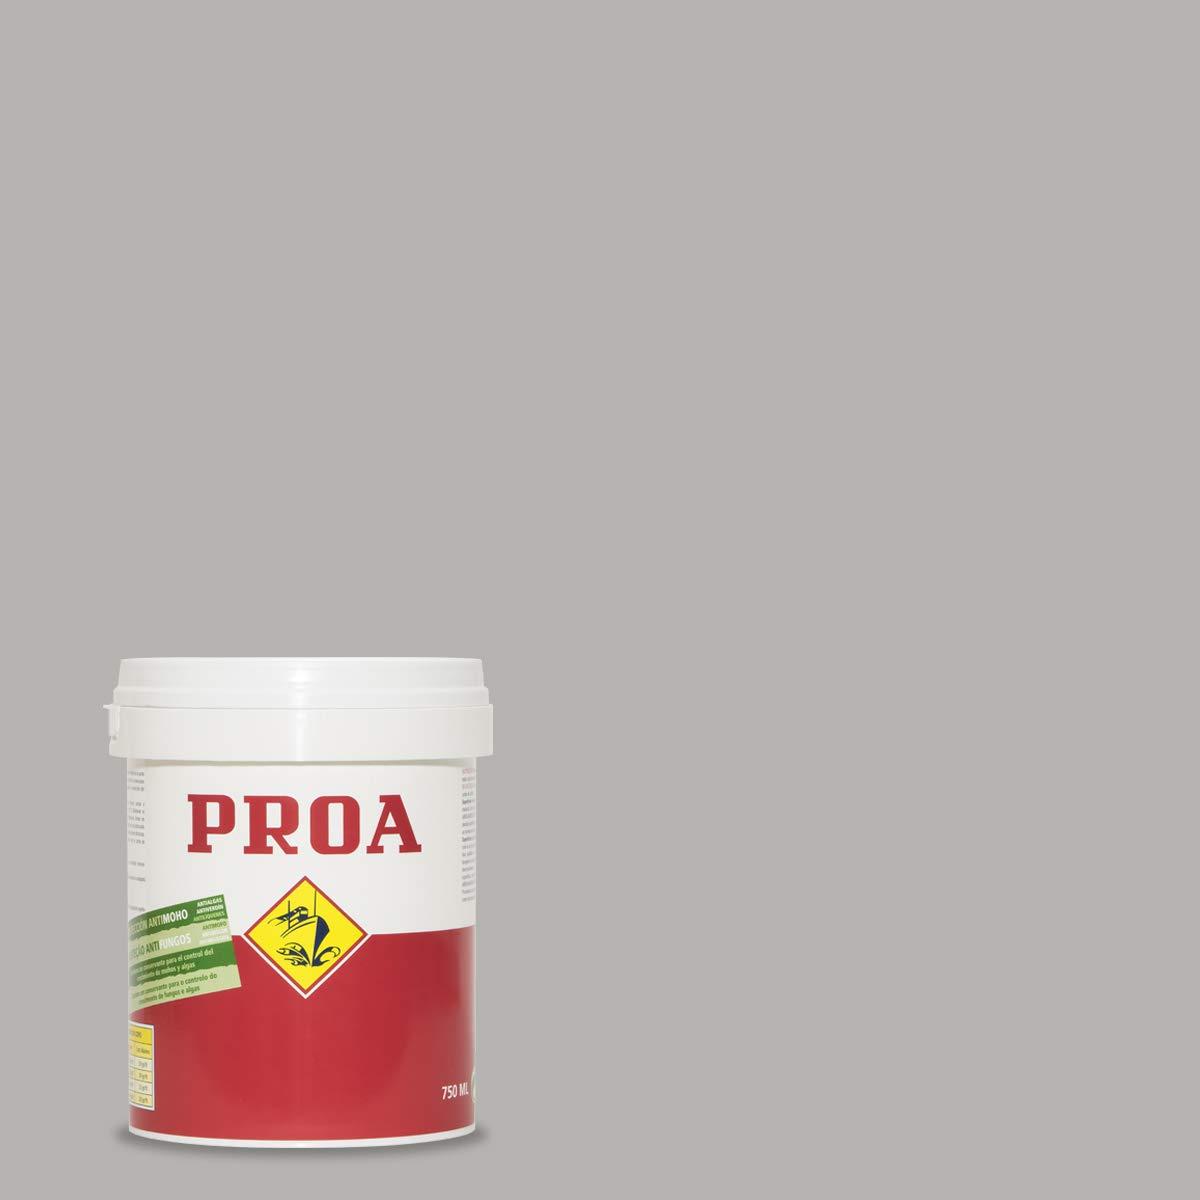 Pintura plástica mate seda antimoho PROA, 4 l, Blanco